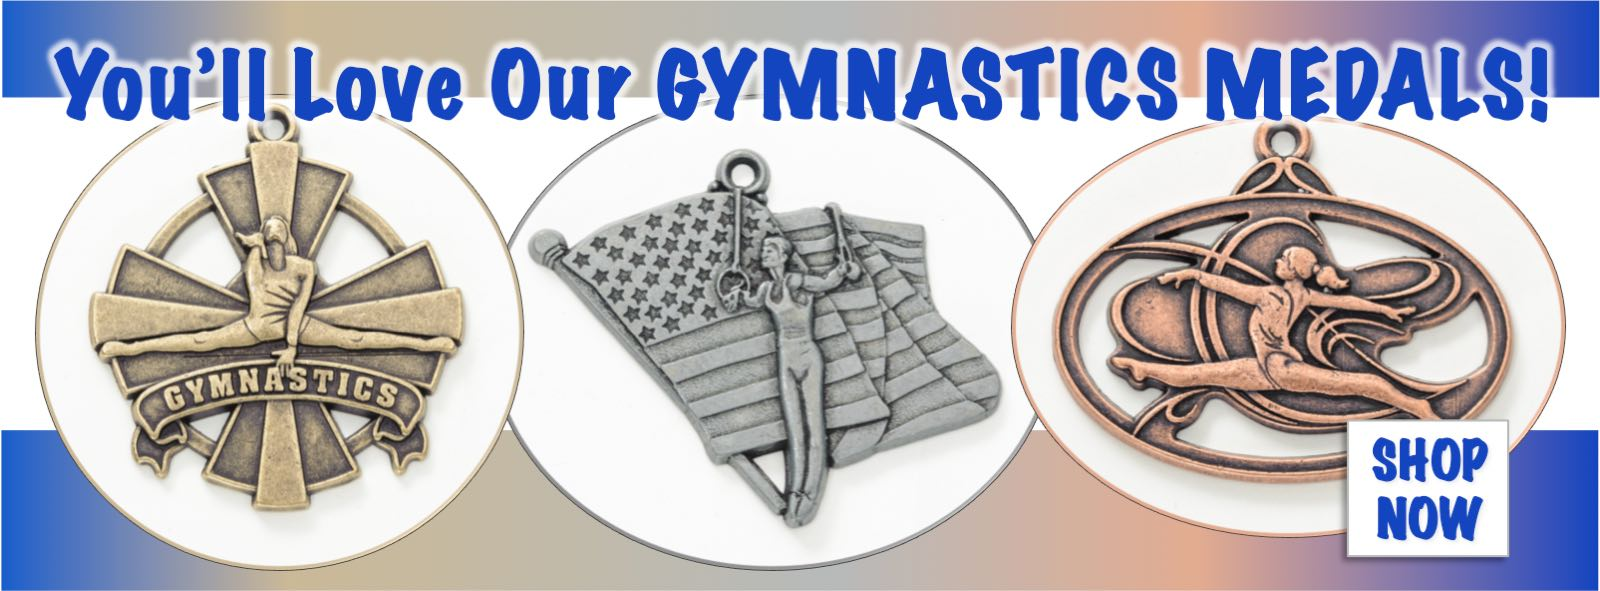 Buy Gymnastics Medals at Elite Etc. We offer a wide arrange of exceptional medals for your gymnastics event, affordably priced.